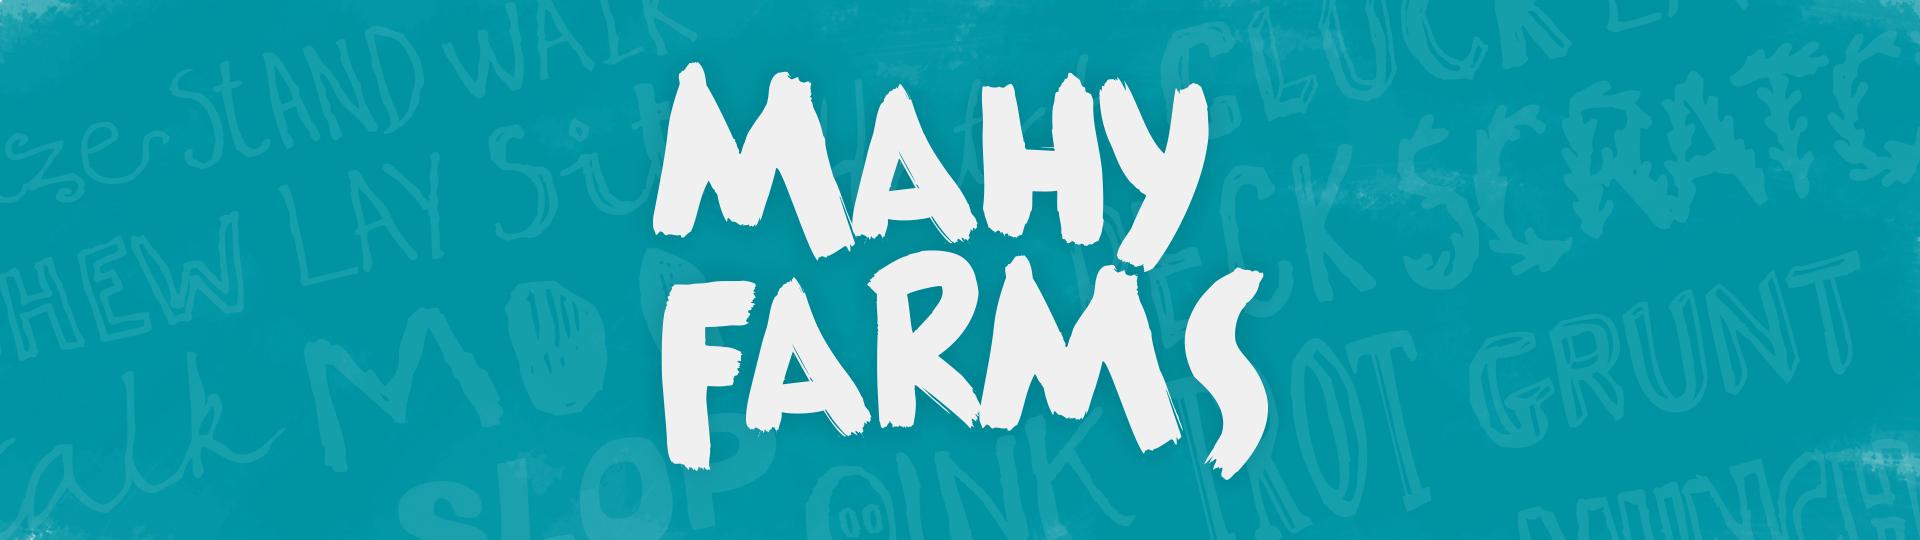 mahy-farm-banner-01